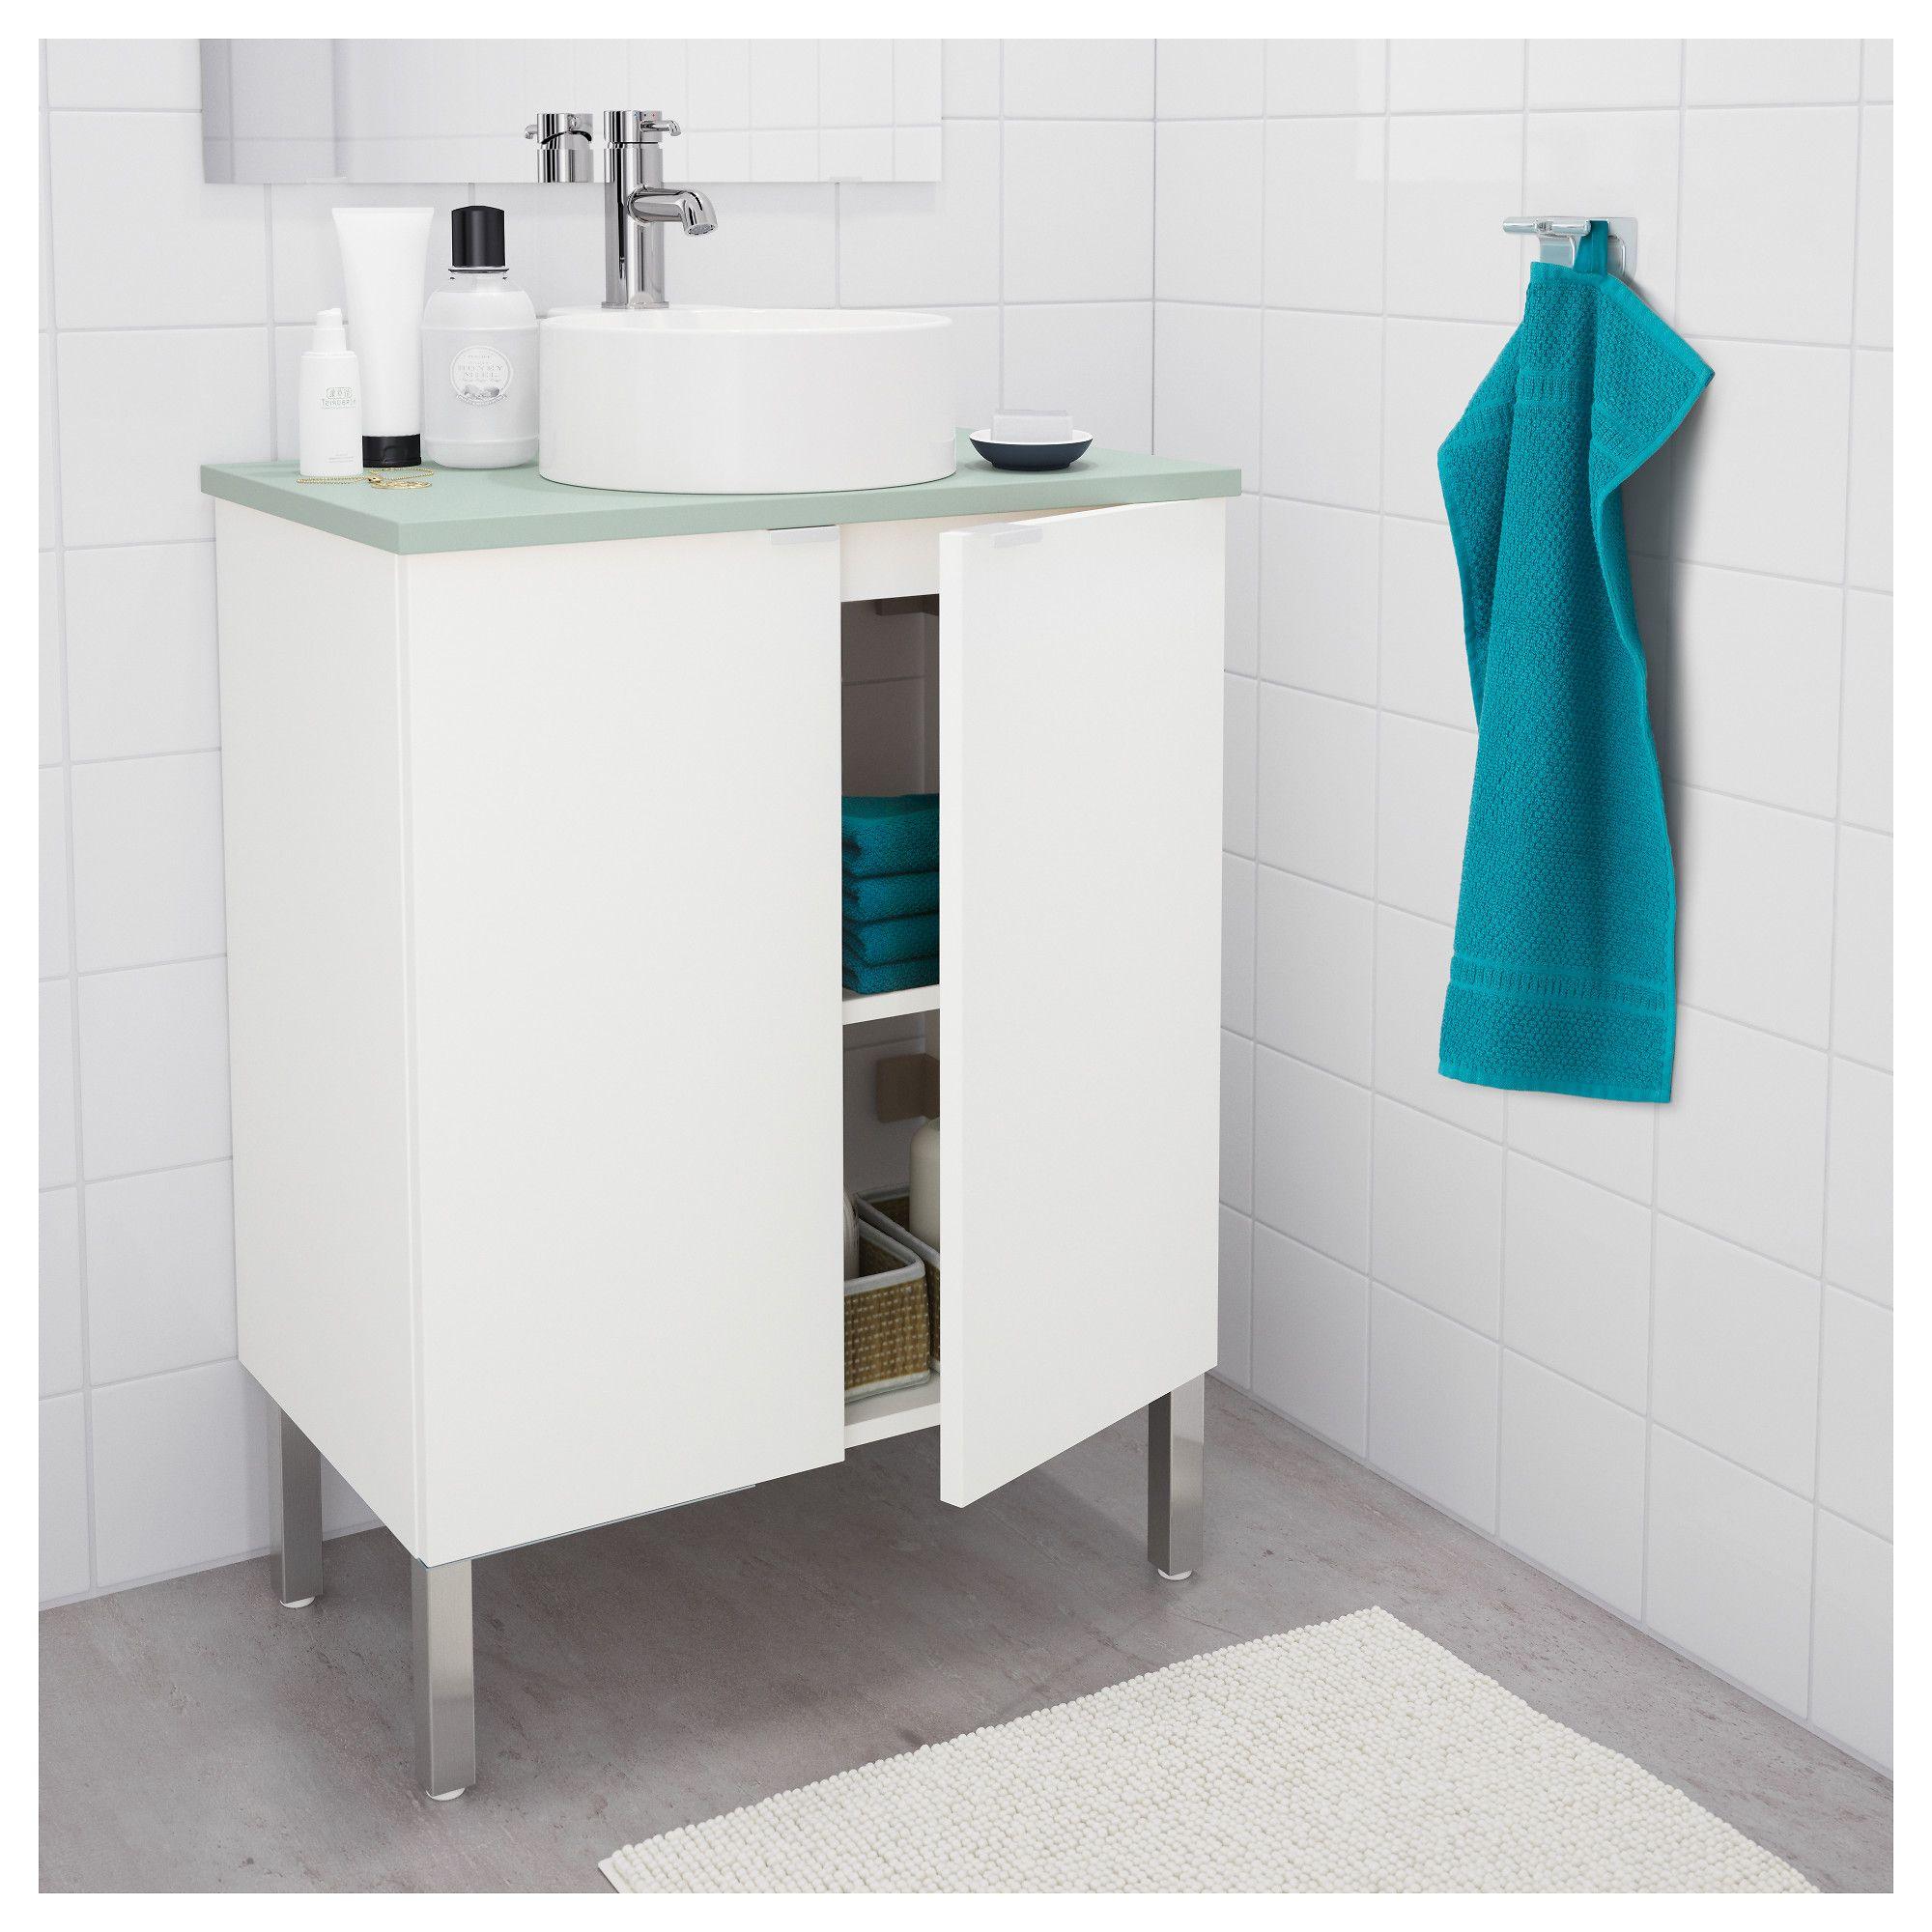 IKEA GUTVIKEN Countertop sink white in 2019 Sink